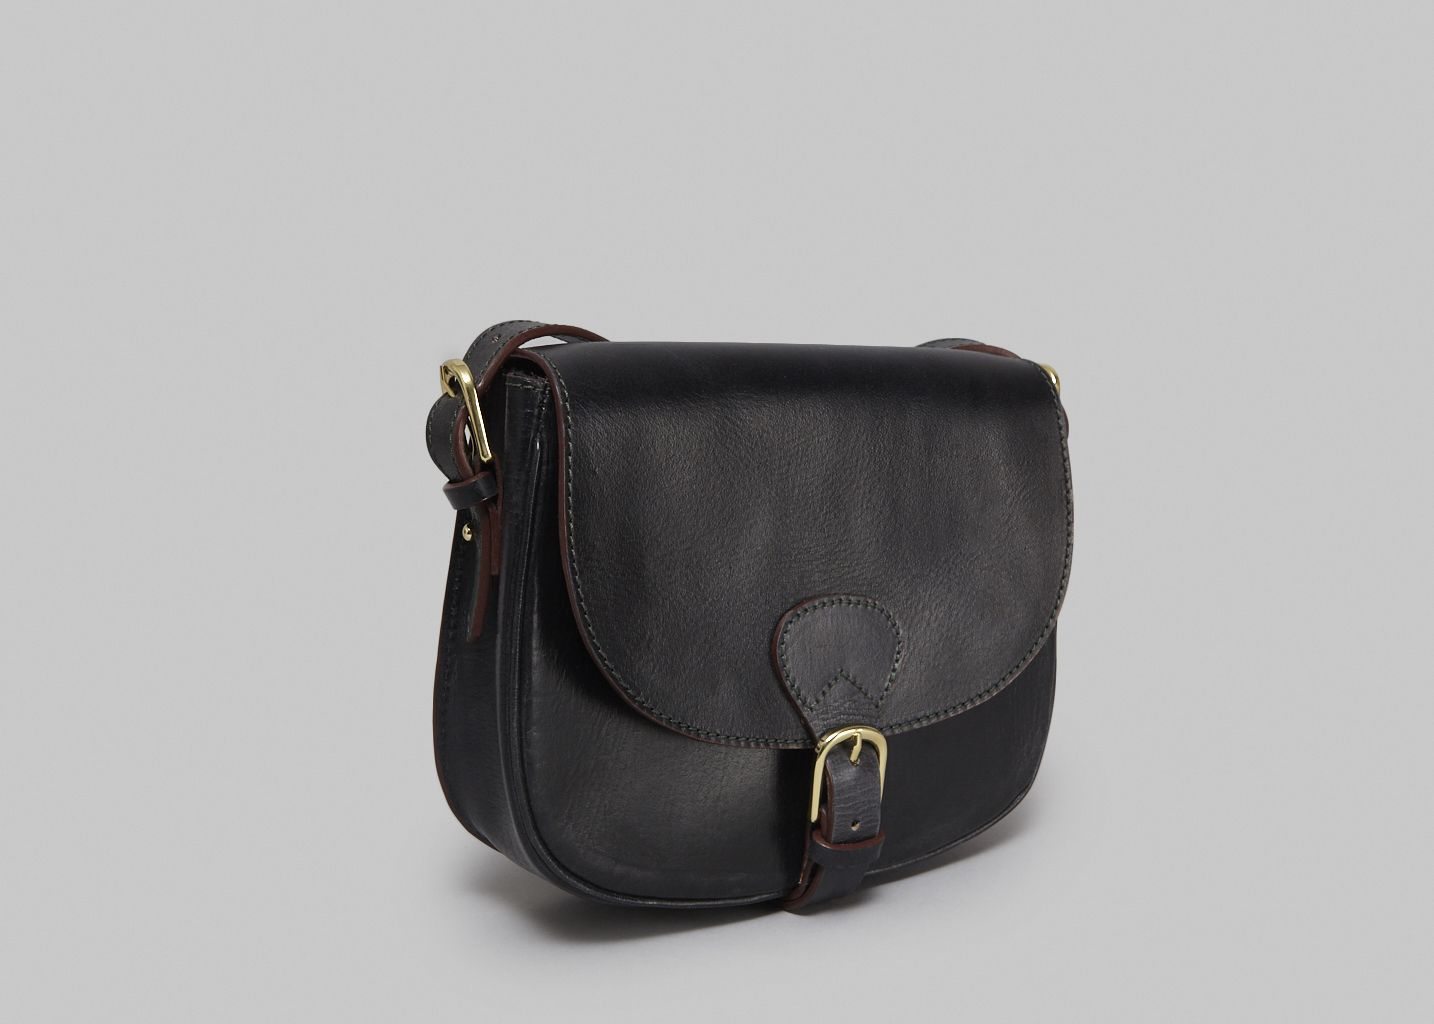 0f15685c56 Cartridge Bag Black Soeur | L'Exception